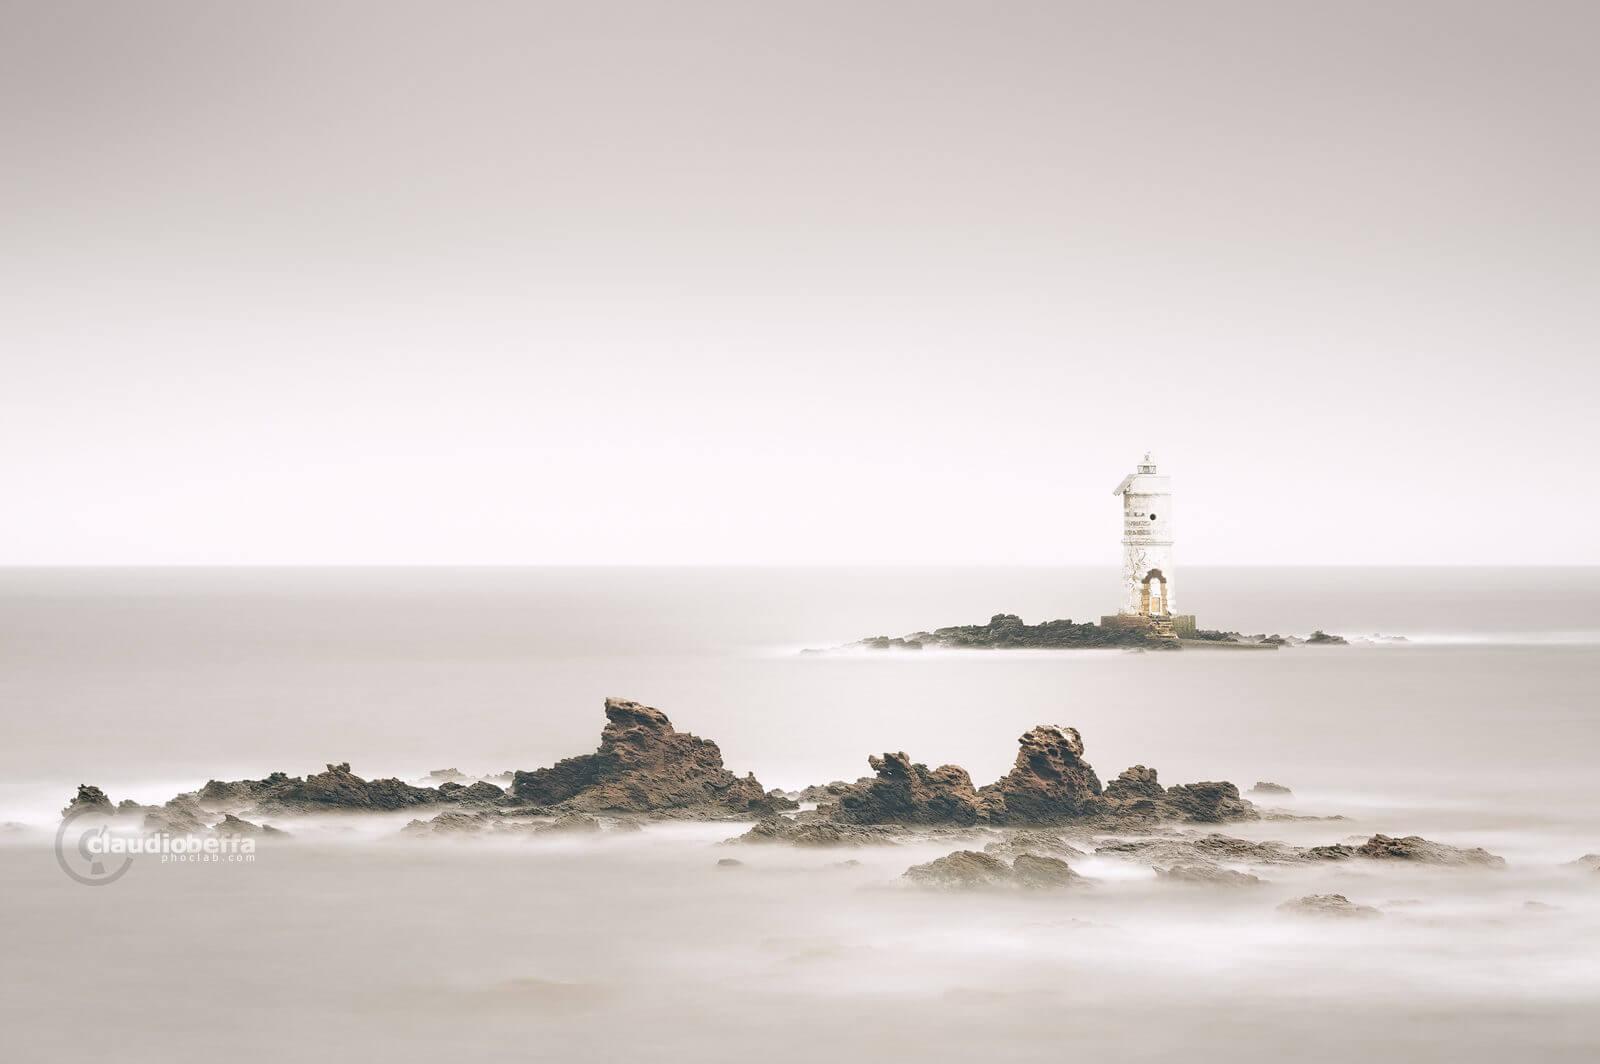 sleeping Boat Eater, Boat Eater, Mangiabarche, lighthouse, rocks, sea, sardinia, italy, long exposure, minimal, minimalist